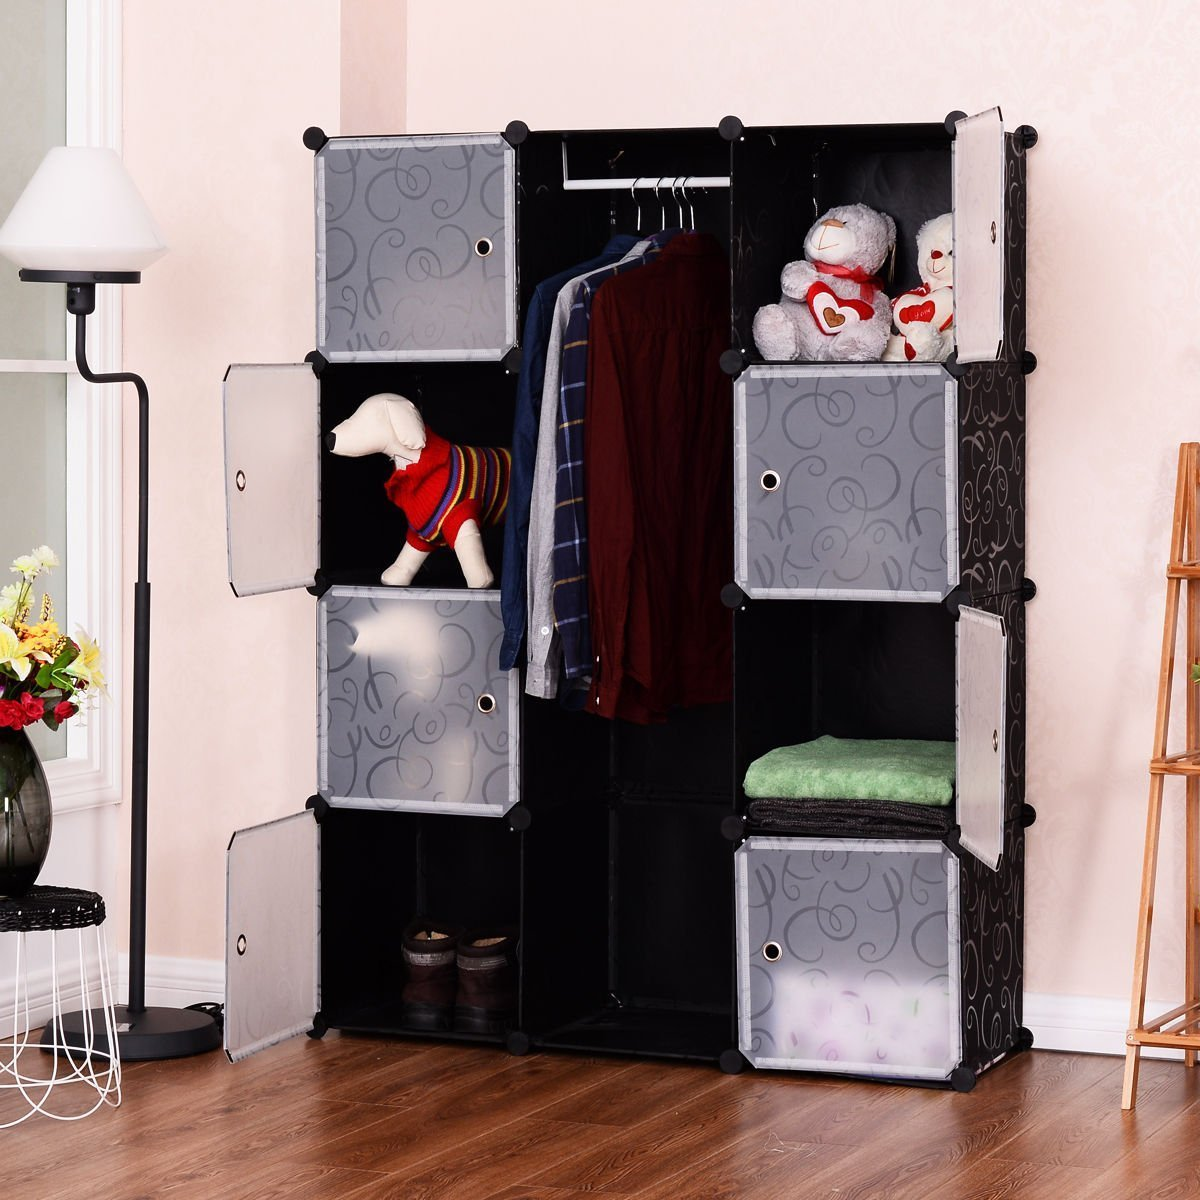 TANGKULA Portable Clothes Closet Wardrobe Bedroom Armoire DIY Storage Organizer Closet Doors, 8 Cubes 1 Hanging Sections